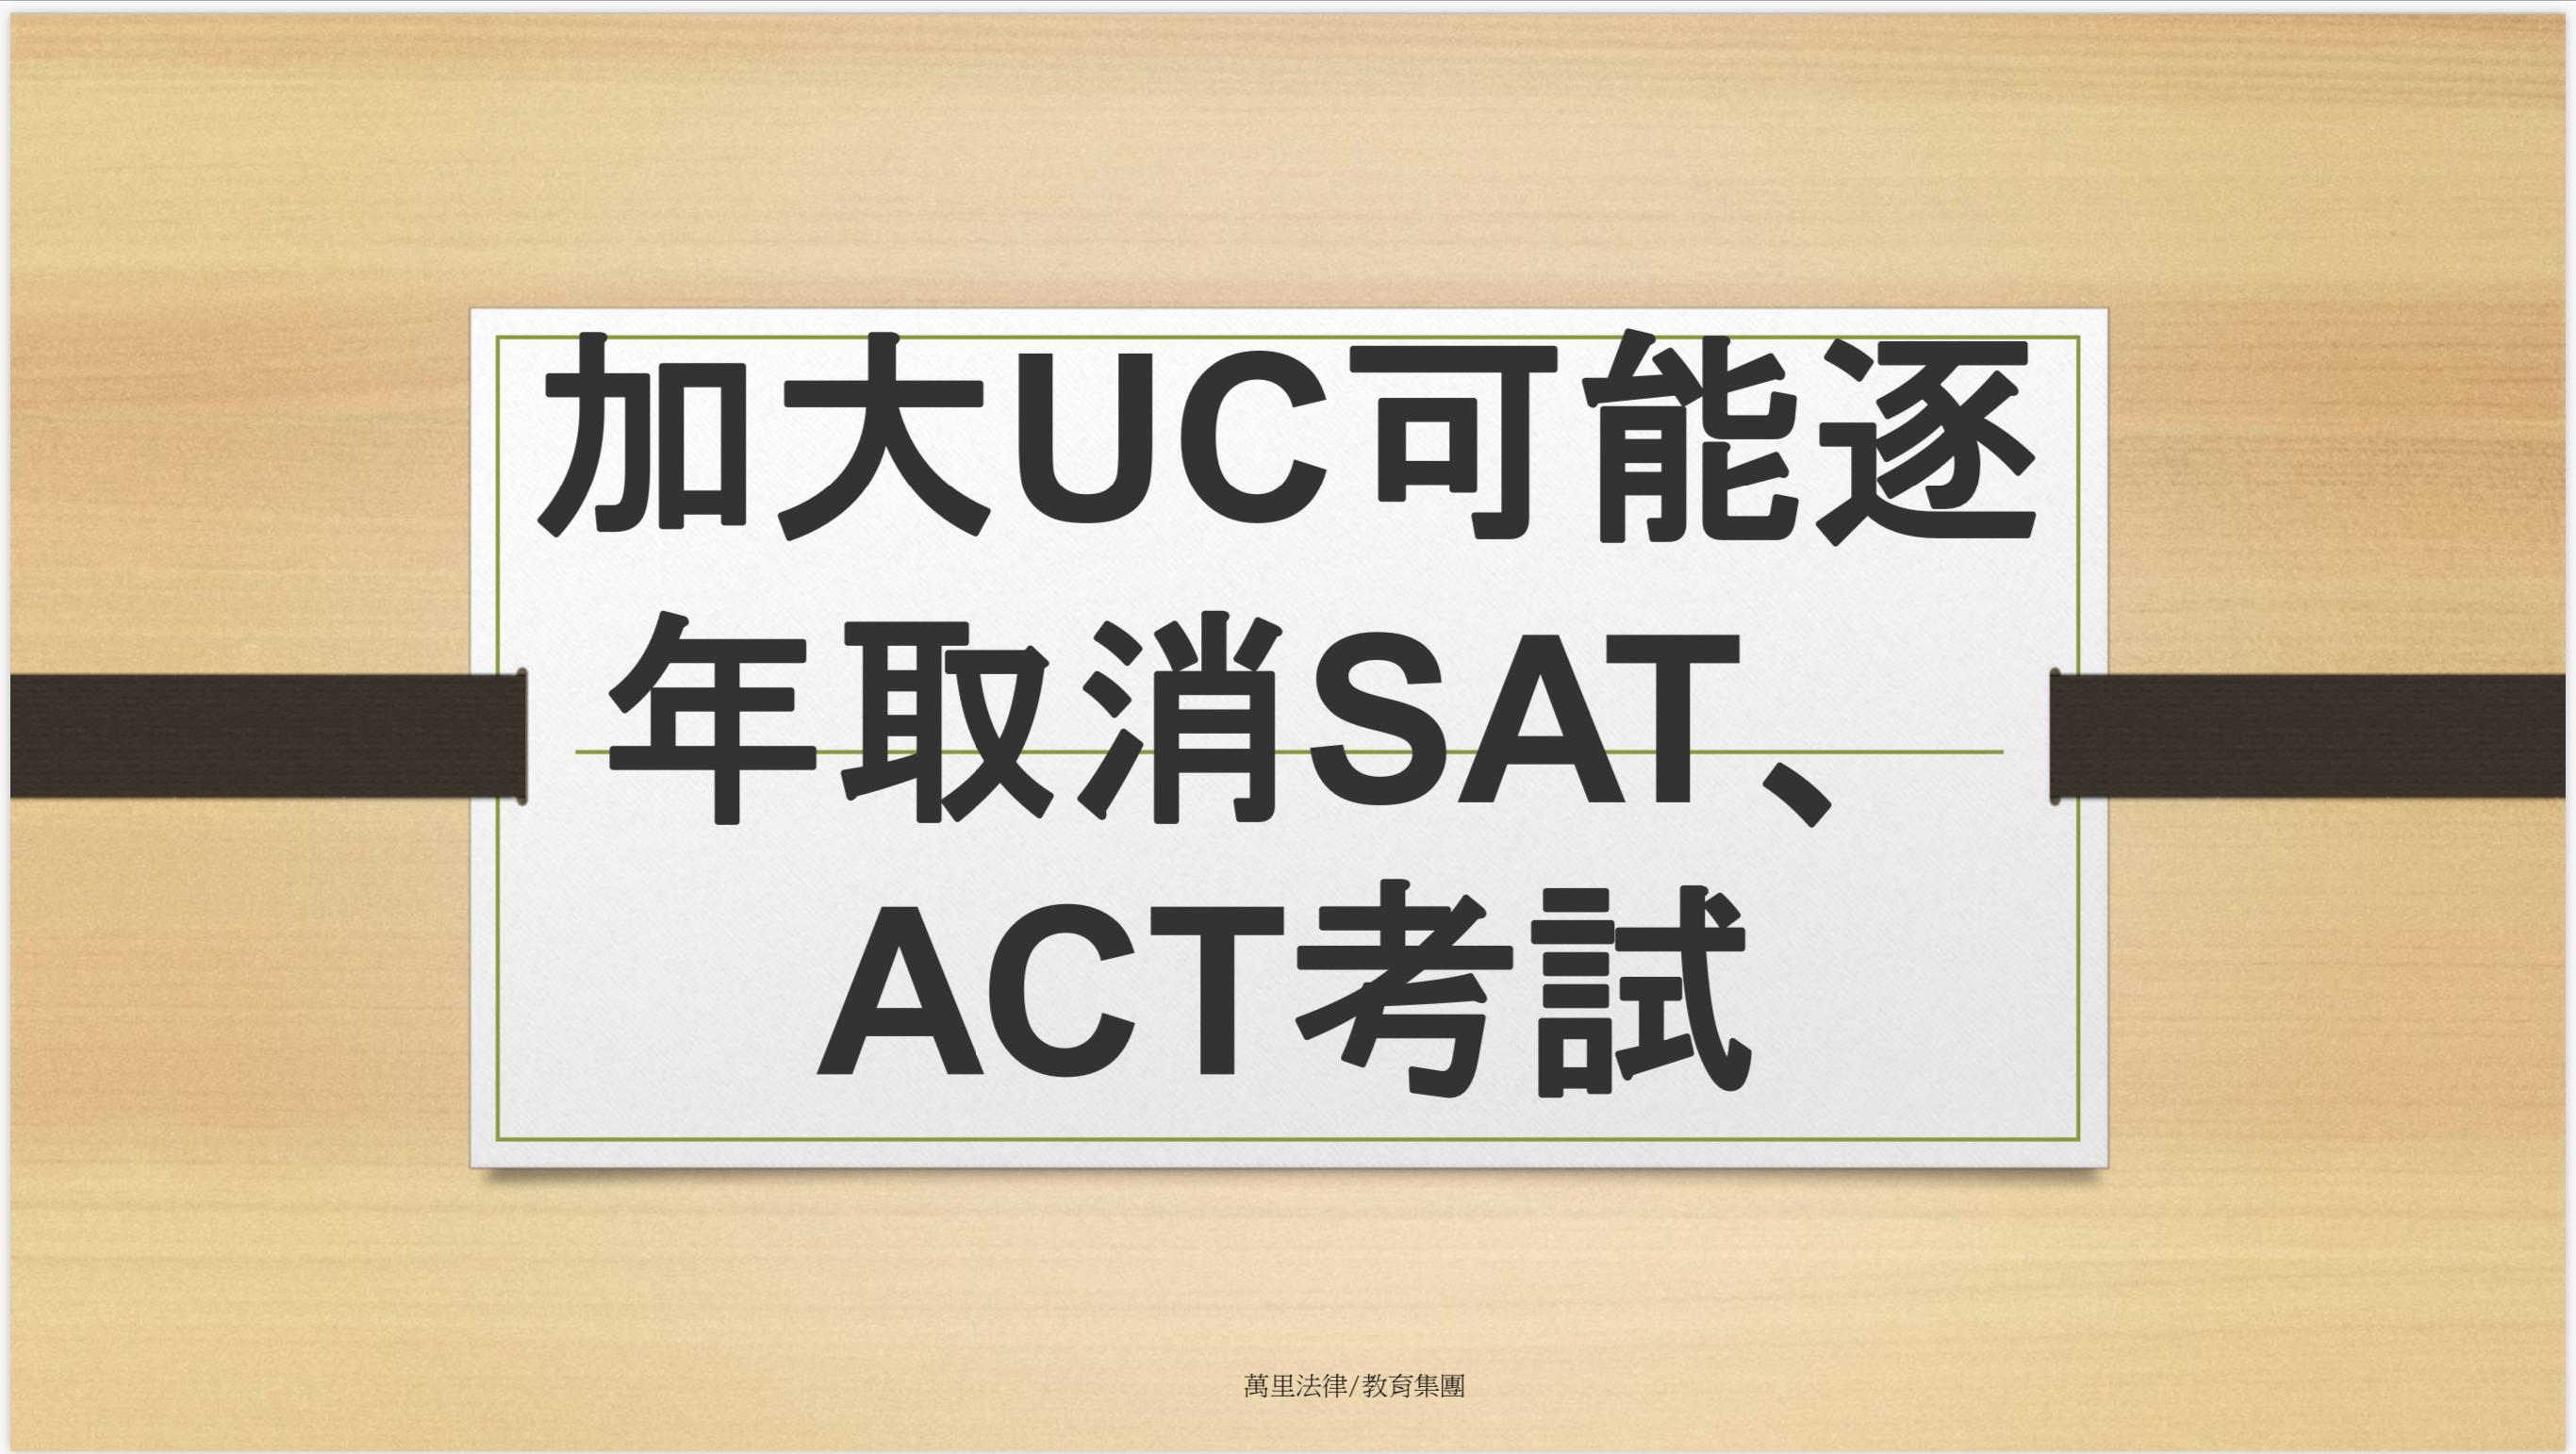 712AAAC1-C648-40A7-8220-D37AE80EDE72